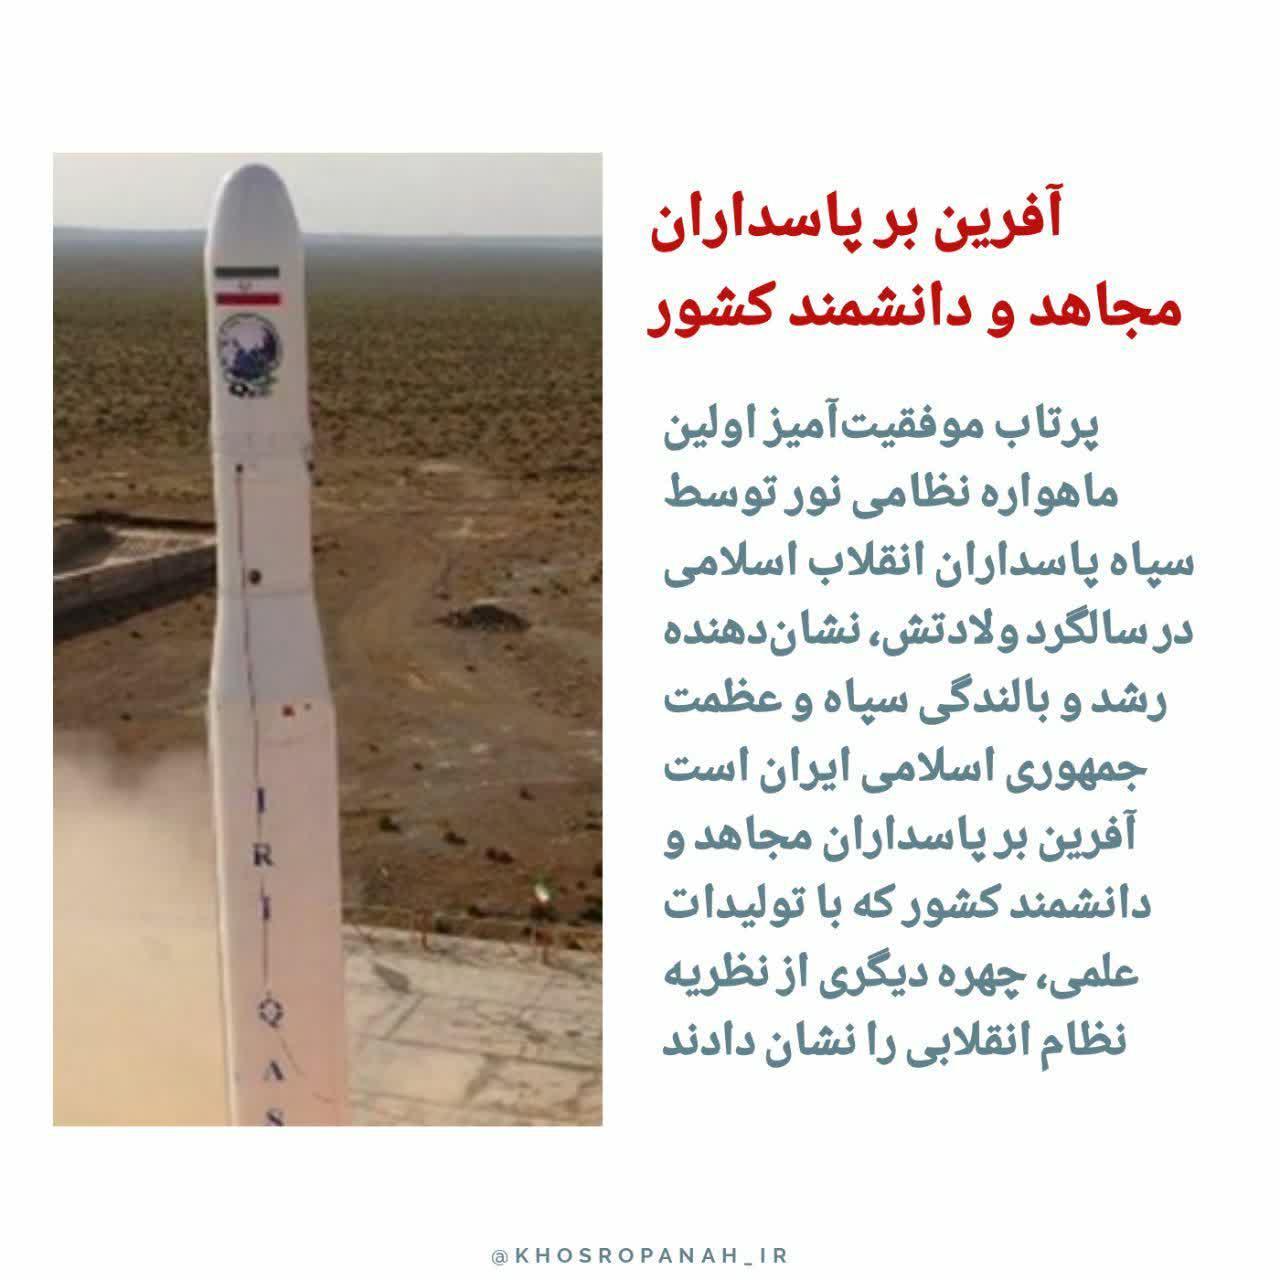 پرتاب ماهواره نور توسط سپاه